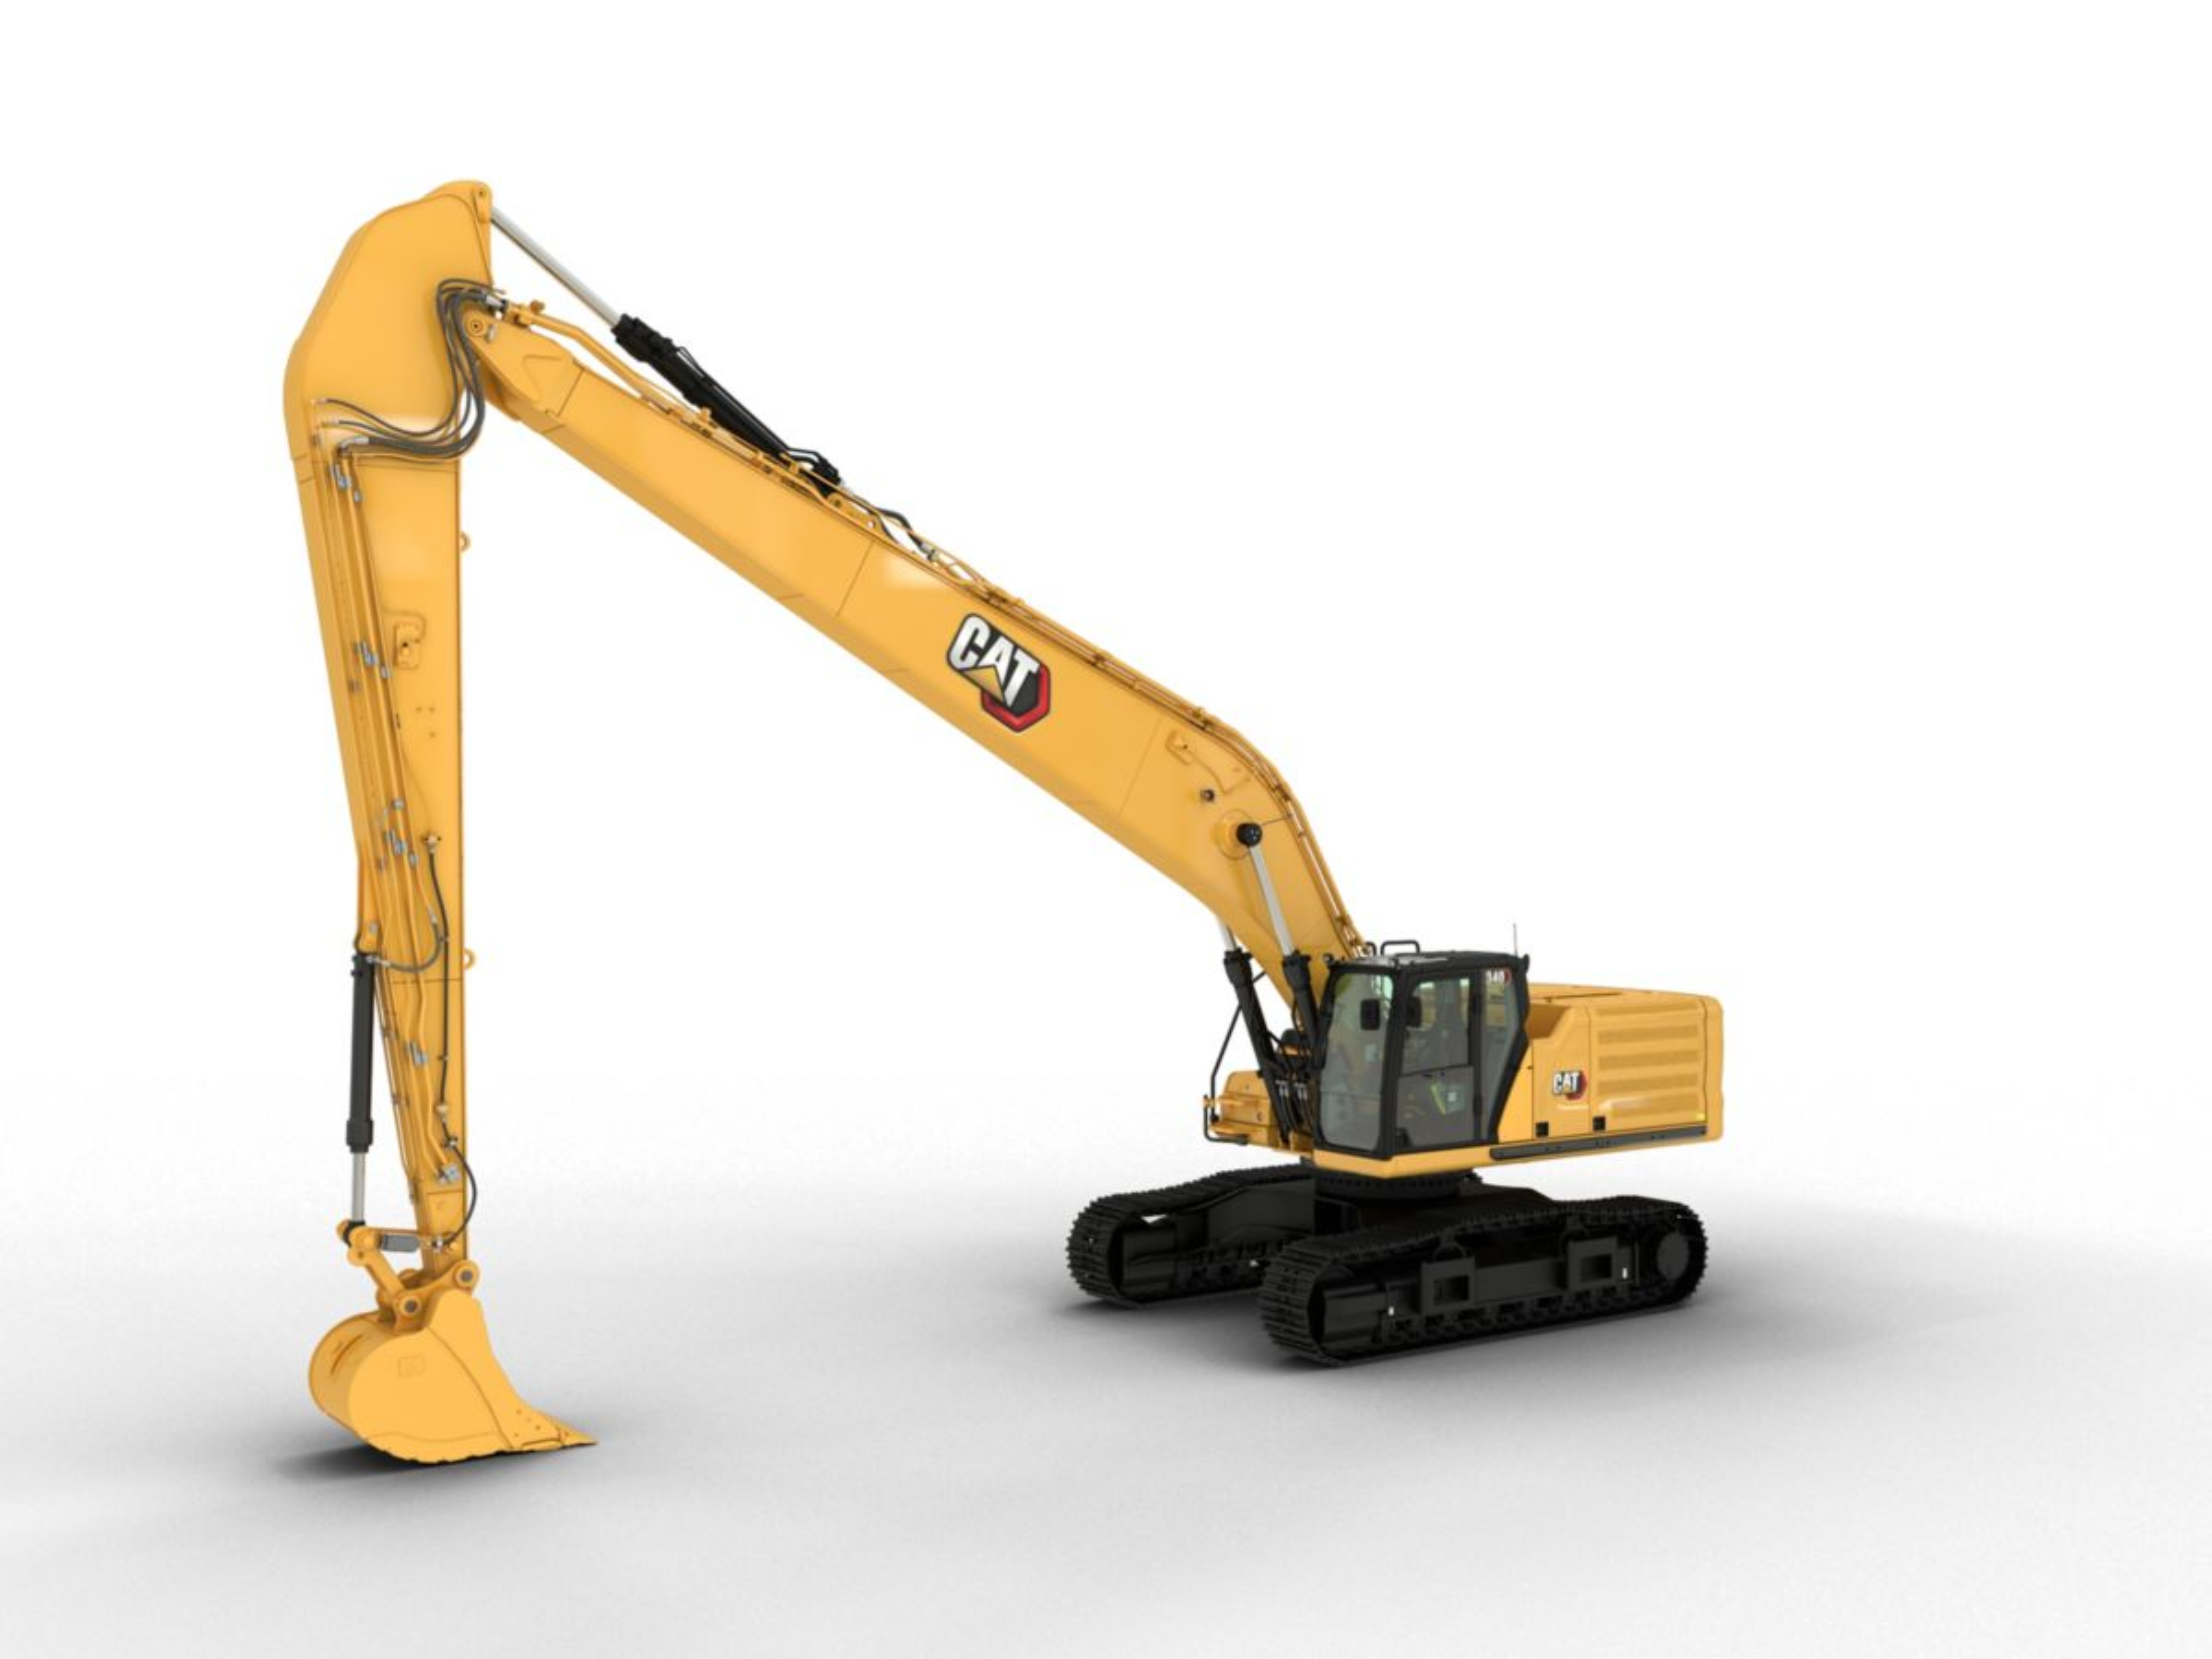 Cat Long Reach Excavators